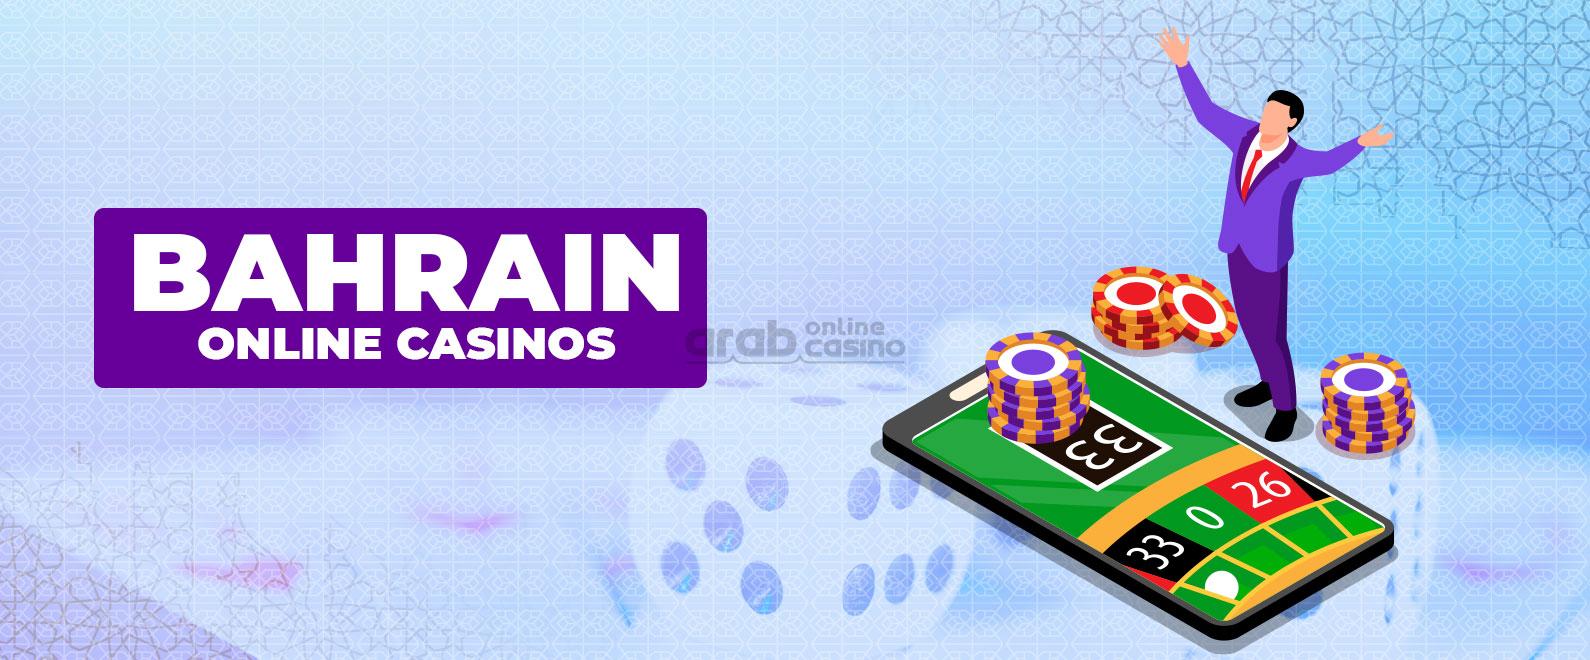 bahrain casinos